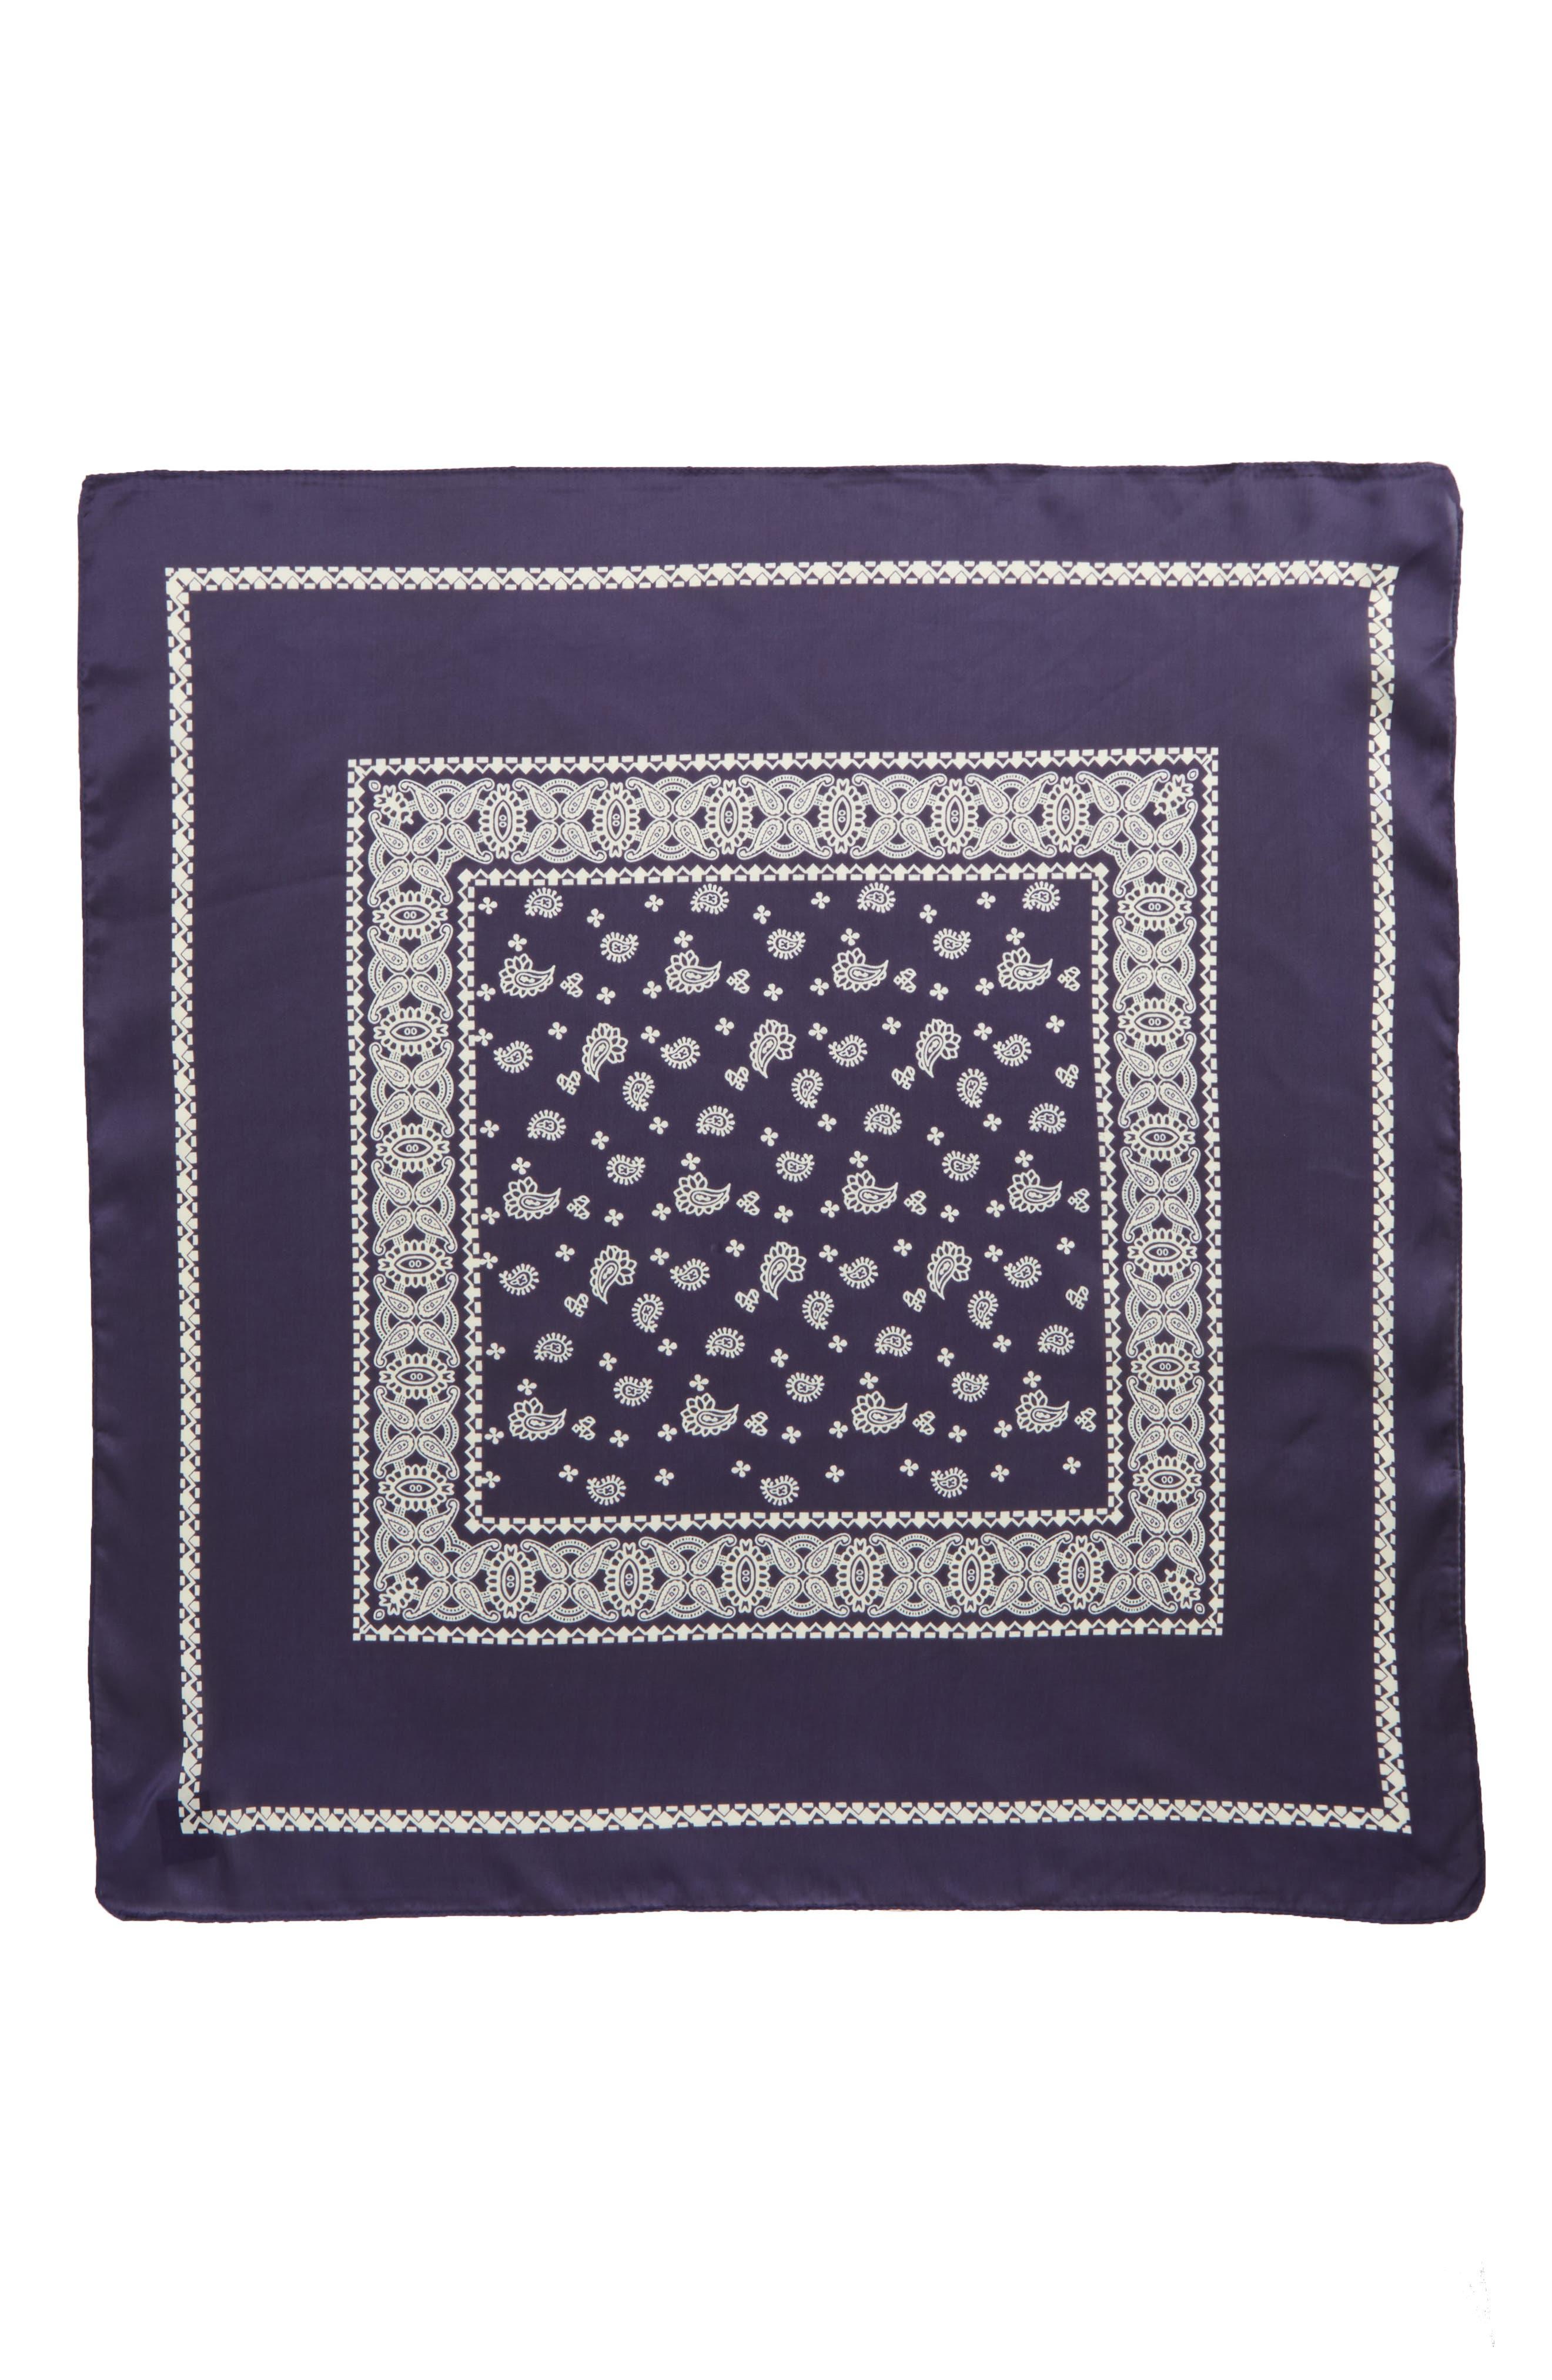 Paisley Handkerchief,                             Alternate thumbnail 2, color,                             410